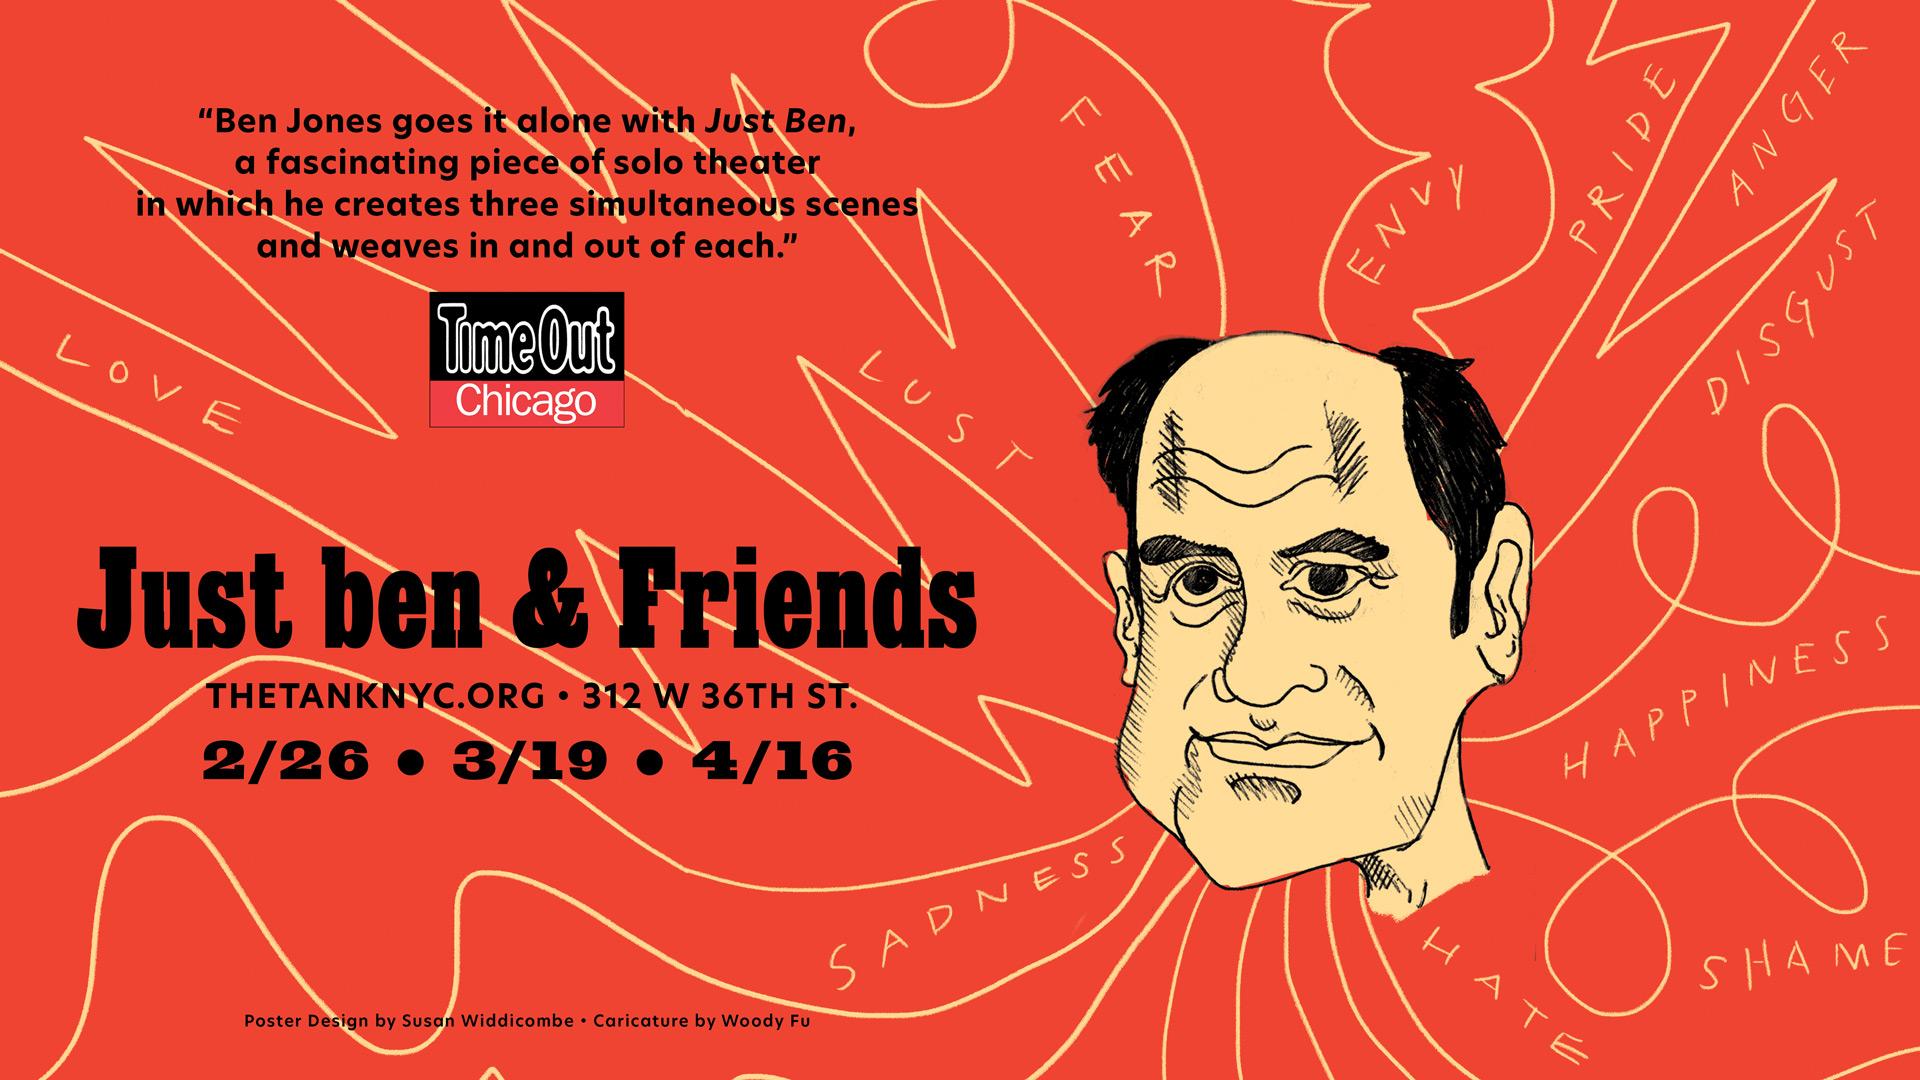 JustBen&Friends_FACEBOOK_EVENT.jpg